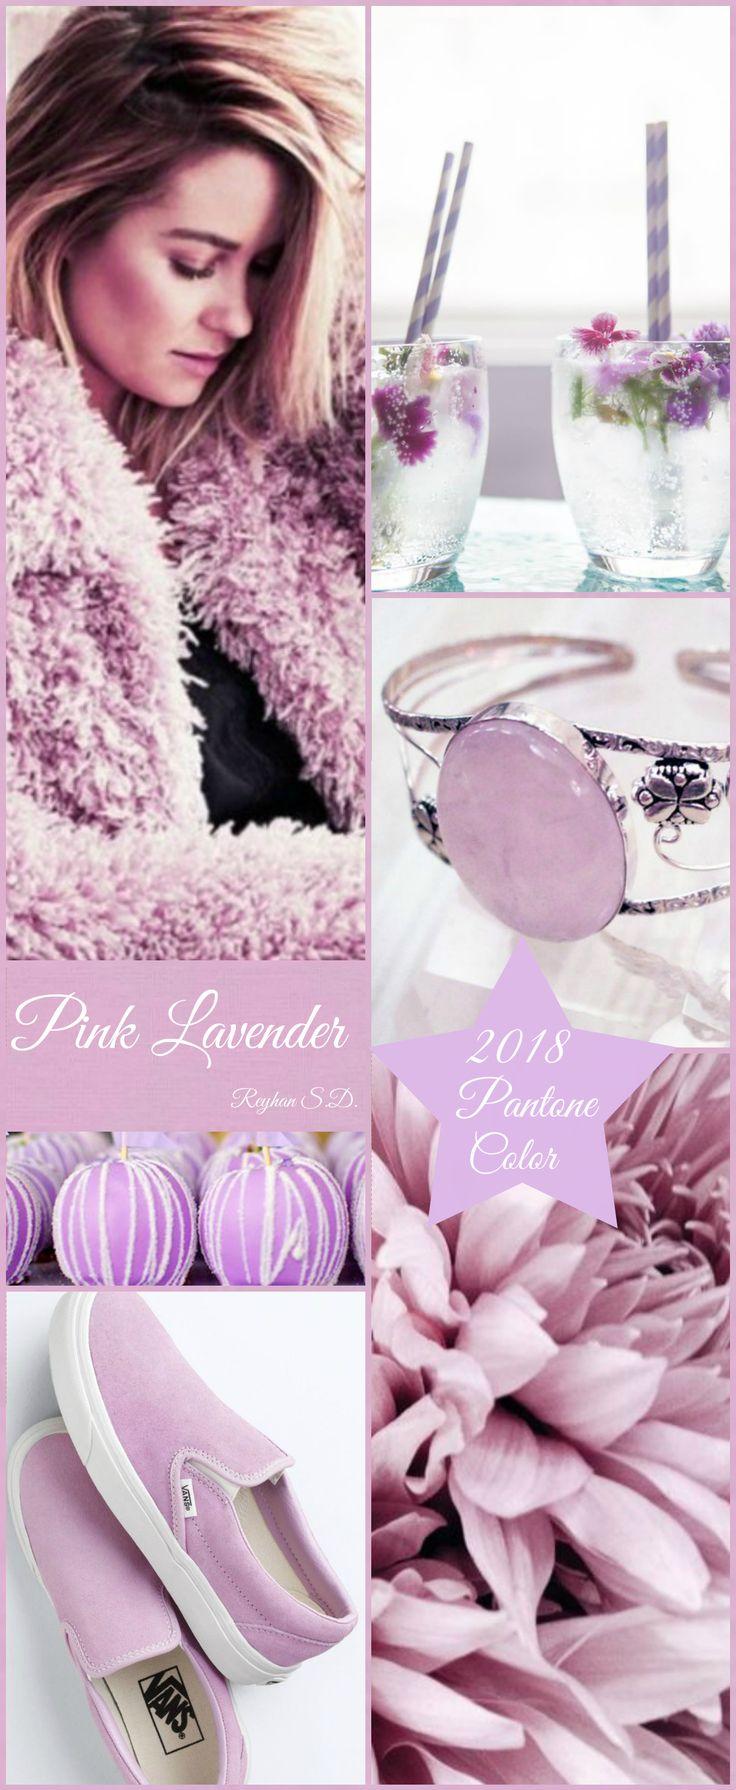 '' Pink Lavender- 2018 Pantone Color '' by Reyhan S.D.